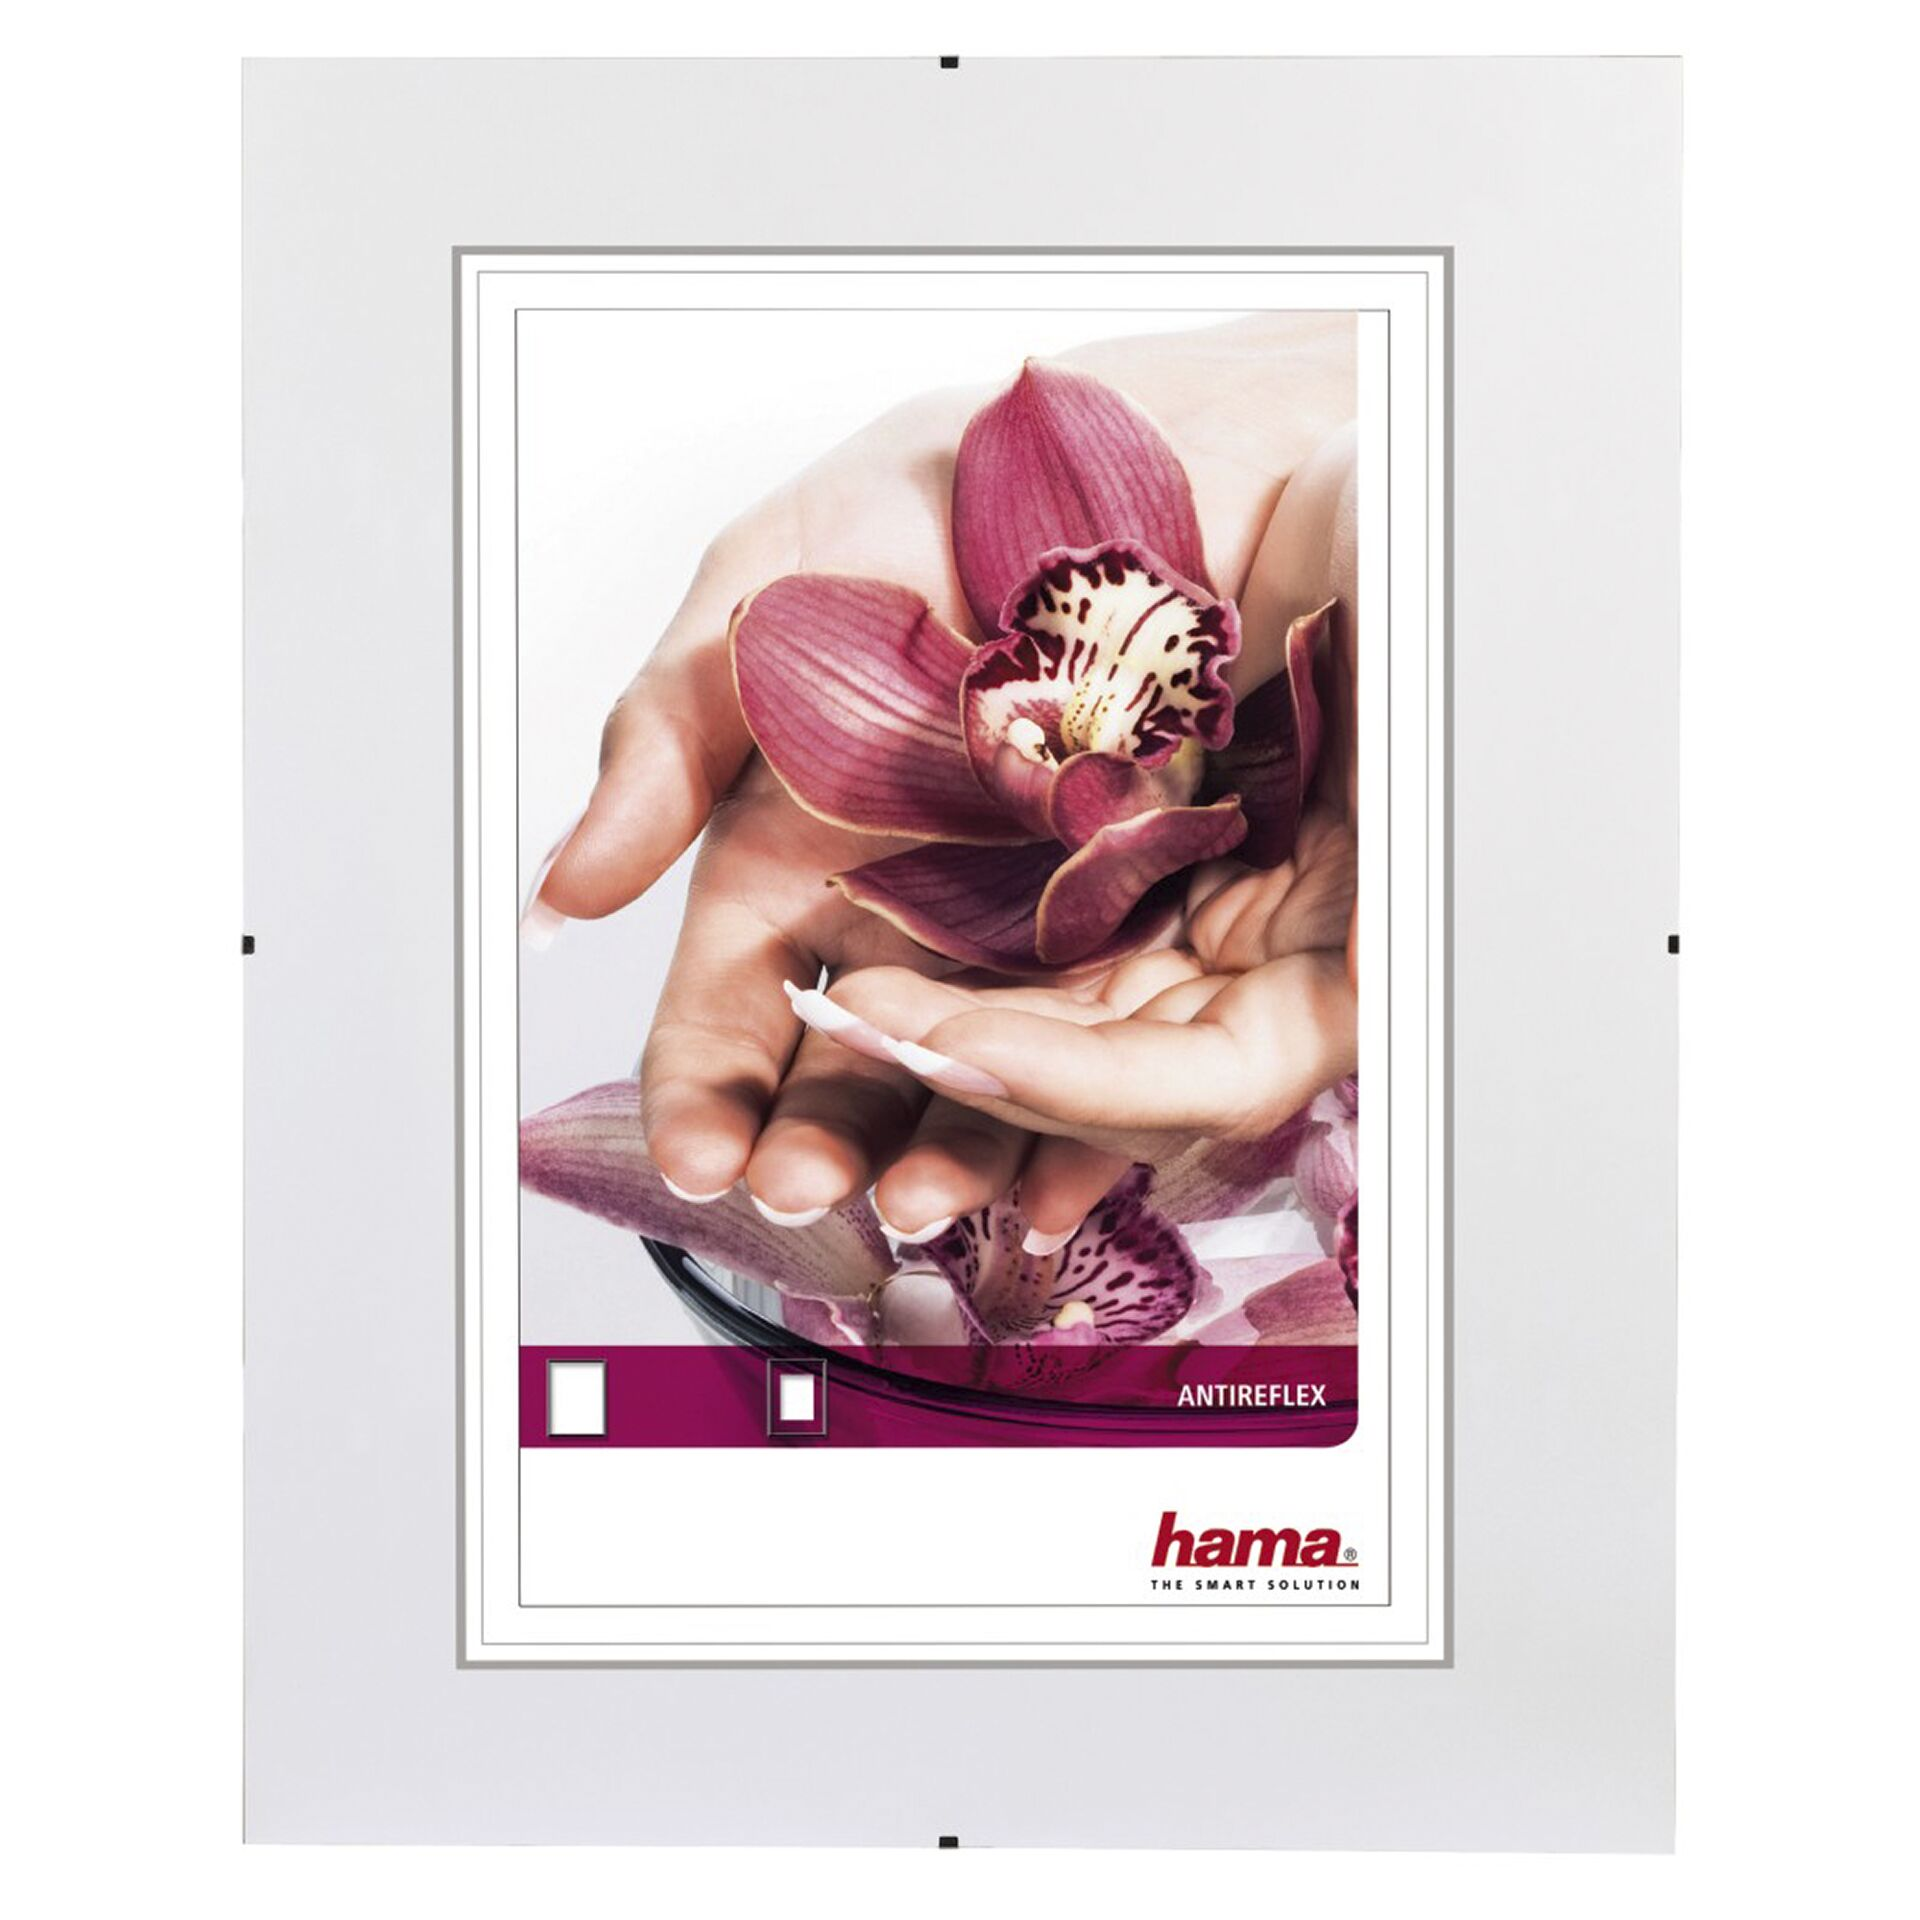 Hama Clip-Fix ARG        10,5x15 rahmenloser Bildhalter     63102